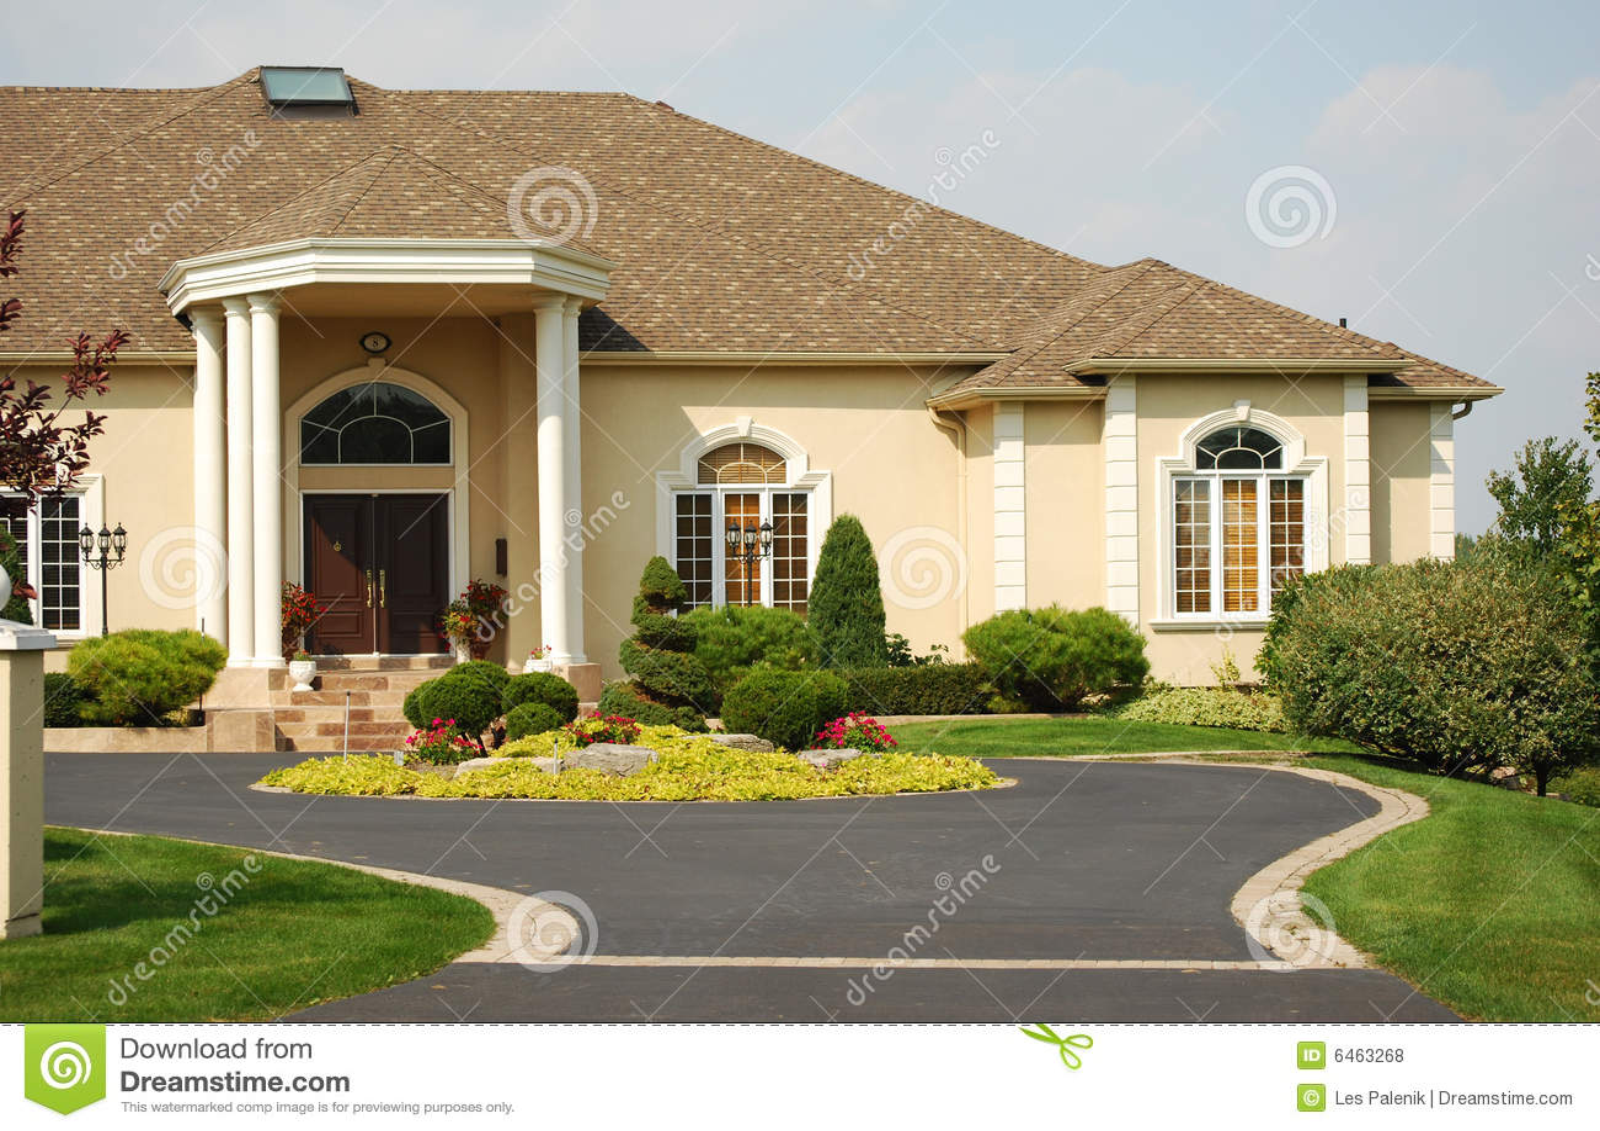 Luxury home entrance royalty free stock photos image 6463268